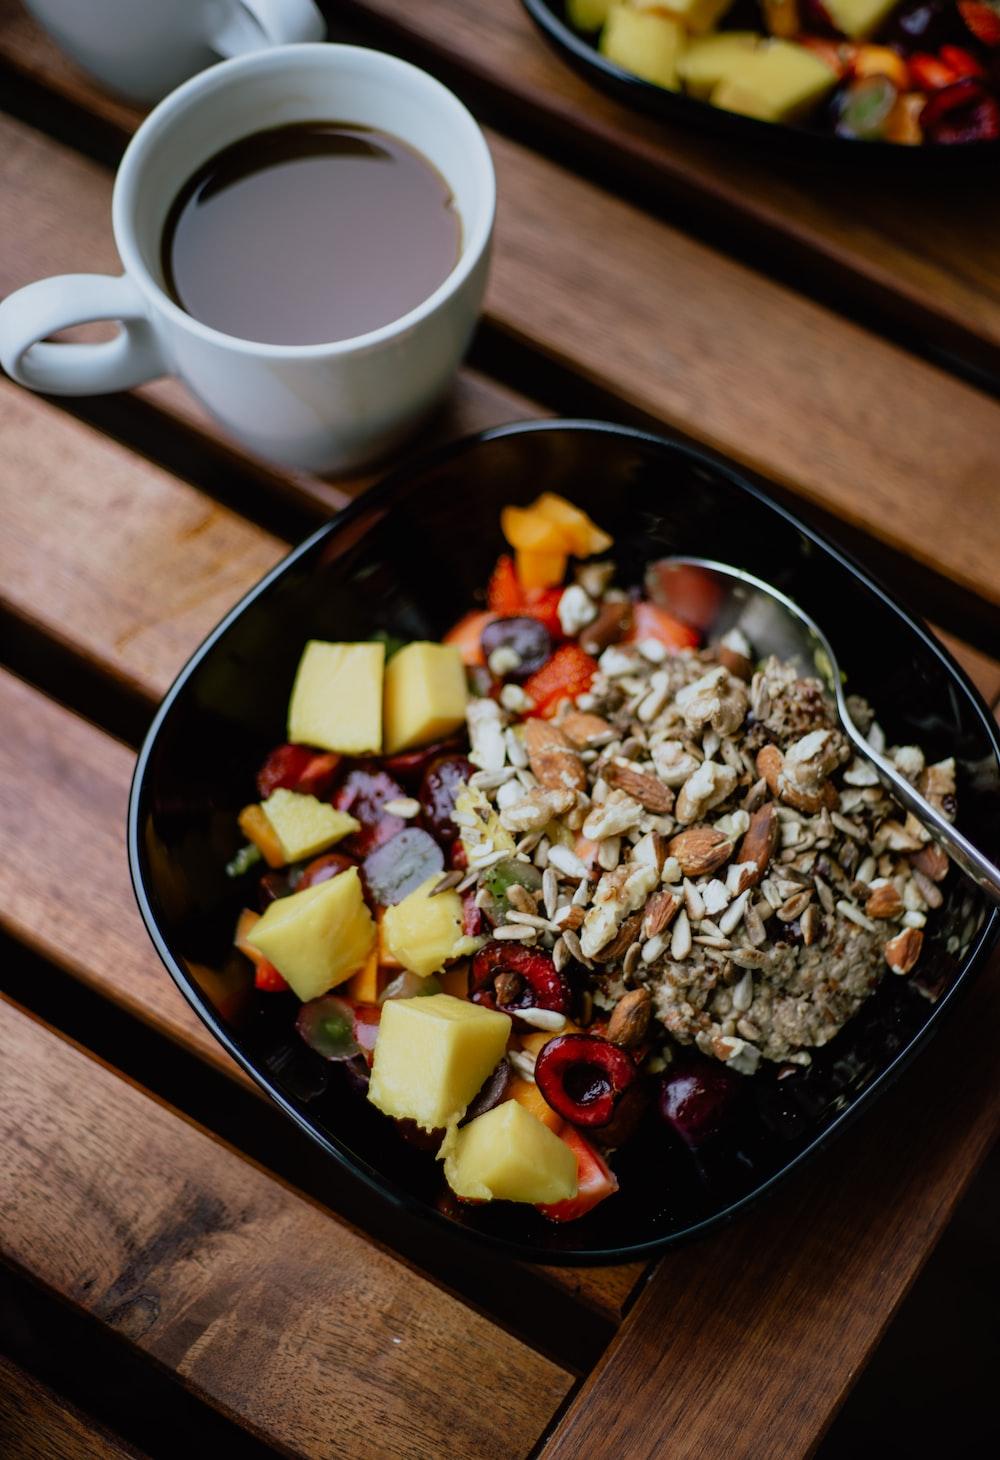 Vegan Coffee: Everything You Need To Know